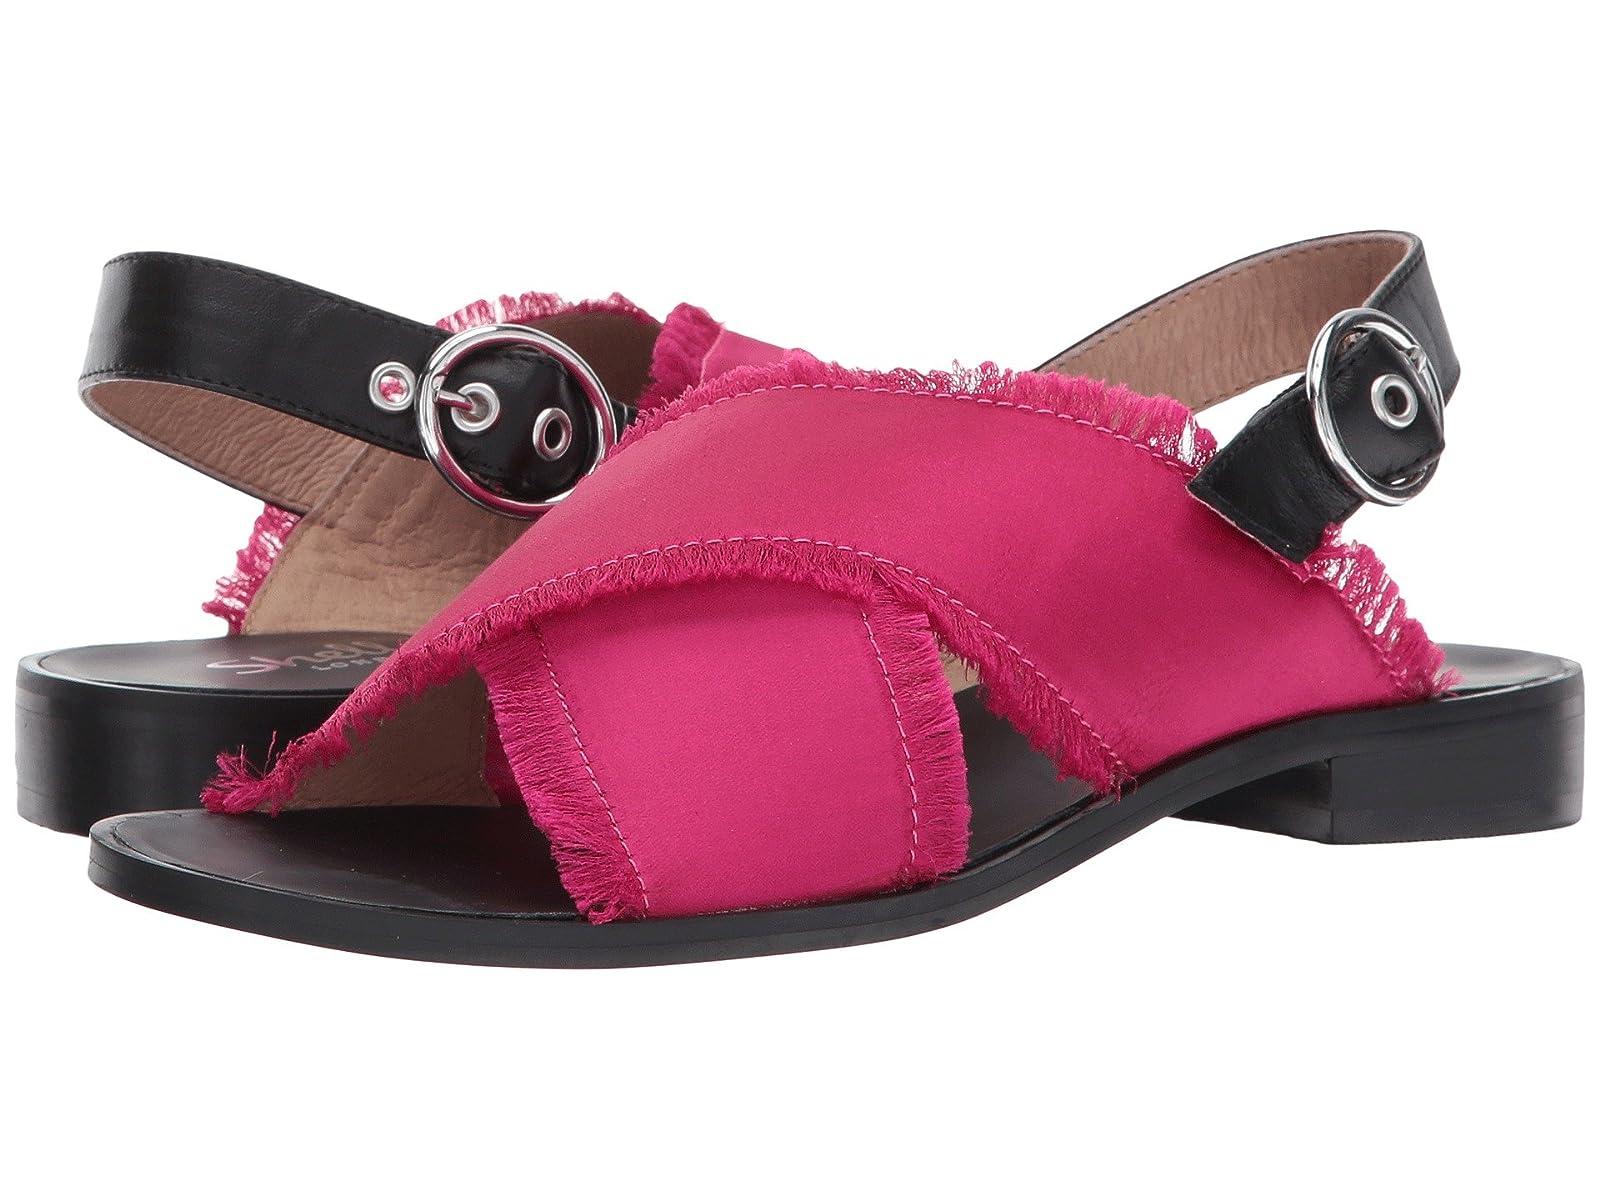 Shellys London Endy Crossband SandalCheap and distinctive eye-catching shoes